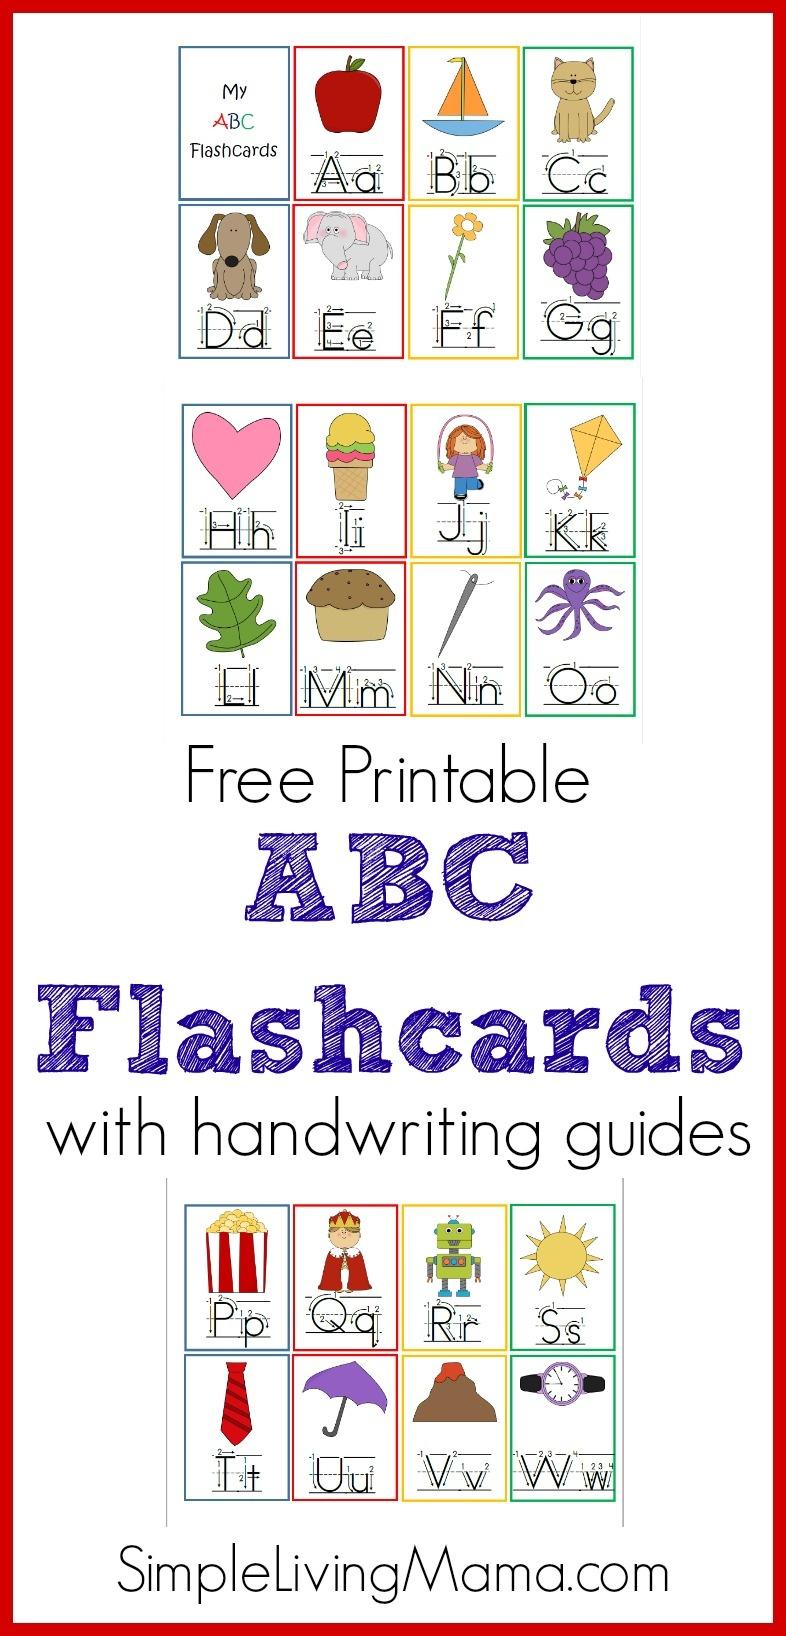 Printable Abc Flashcards - Homeschool Printables For Free - Free Printable Abc Flashcards